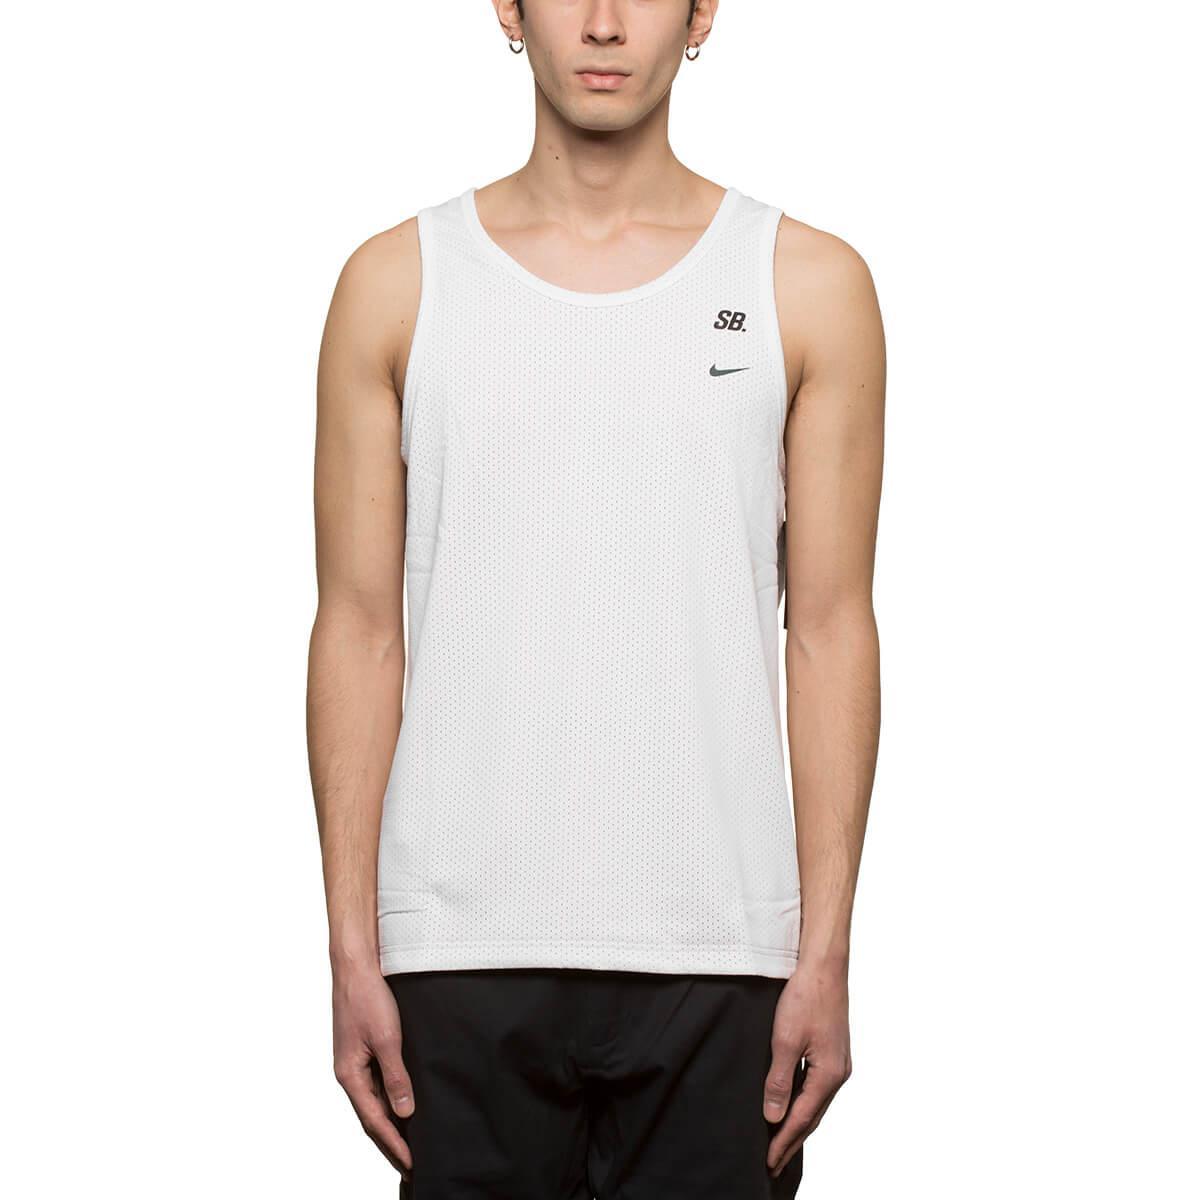 cb54bb79df242 Lyst - Nike Mesh Tank Top in White for Men